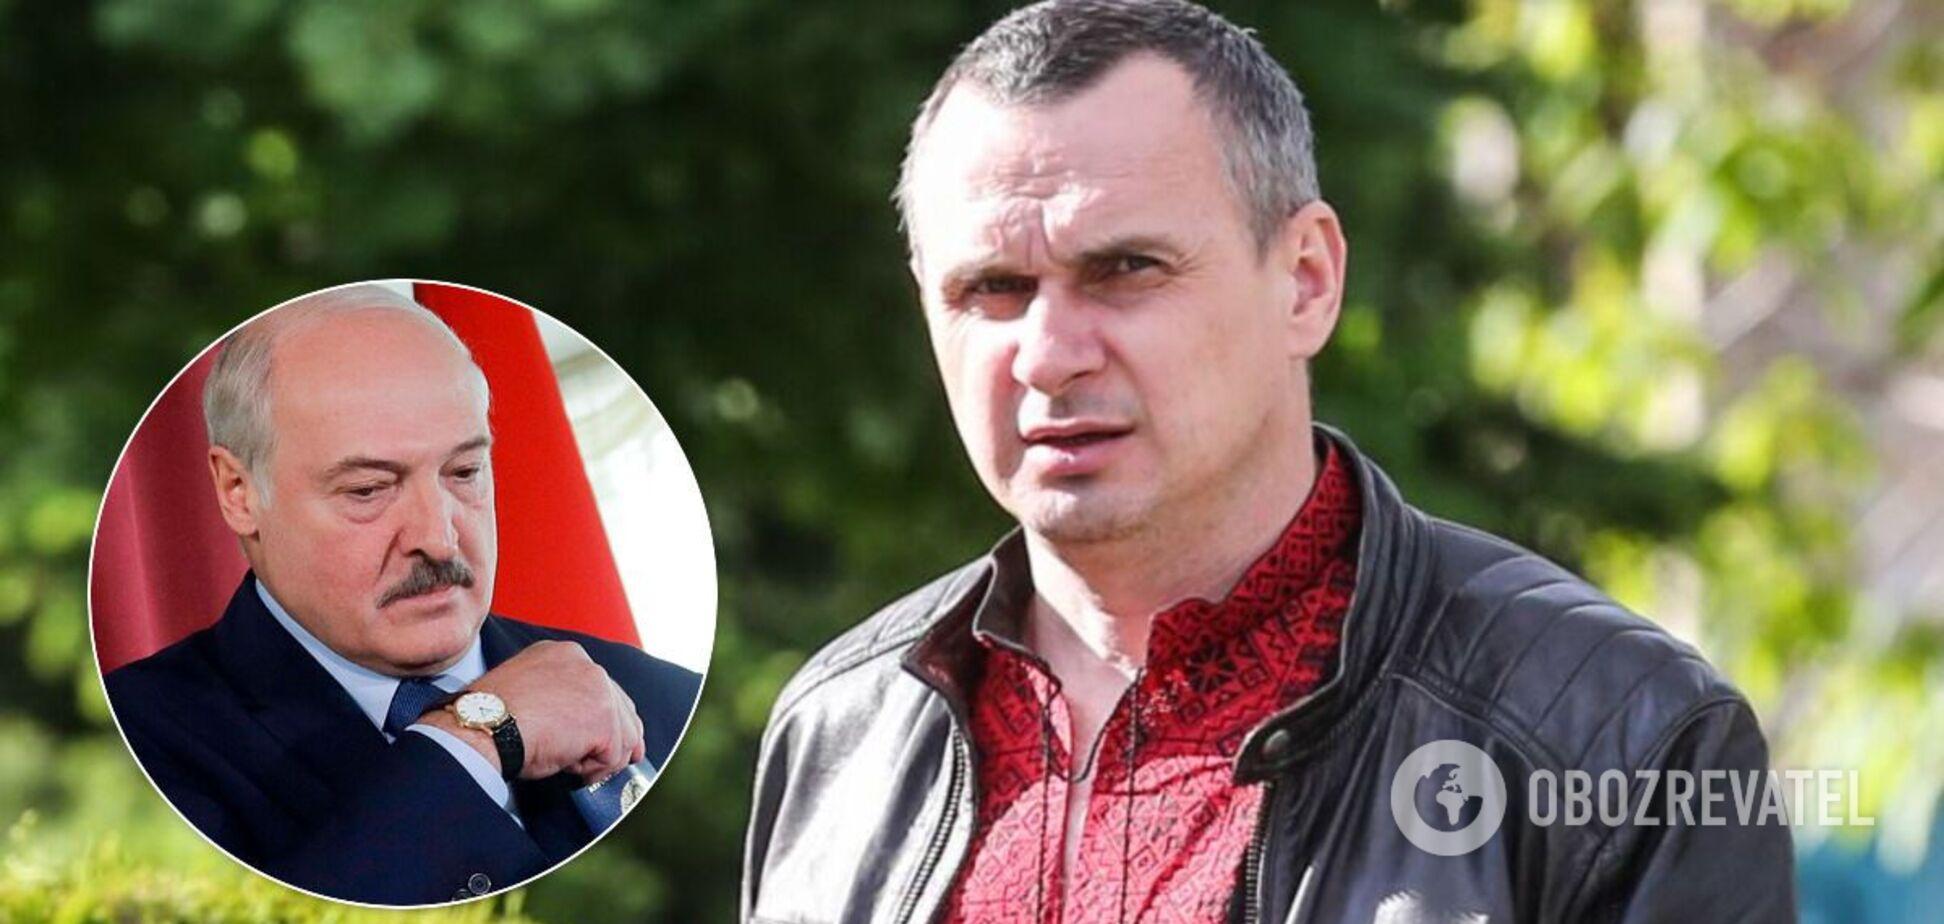 Сенцов обозвал Лукашенко 'кровавым тараканом'